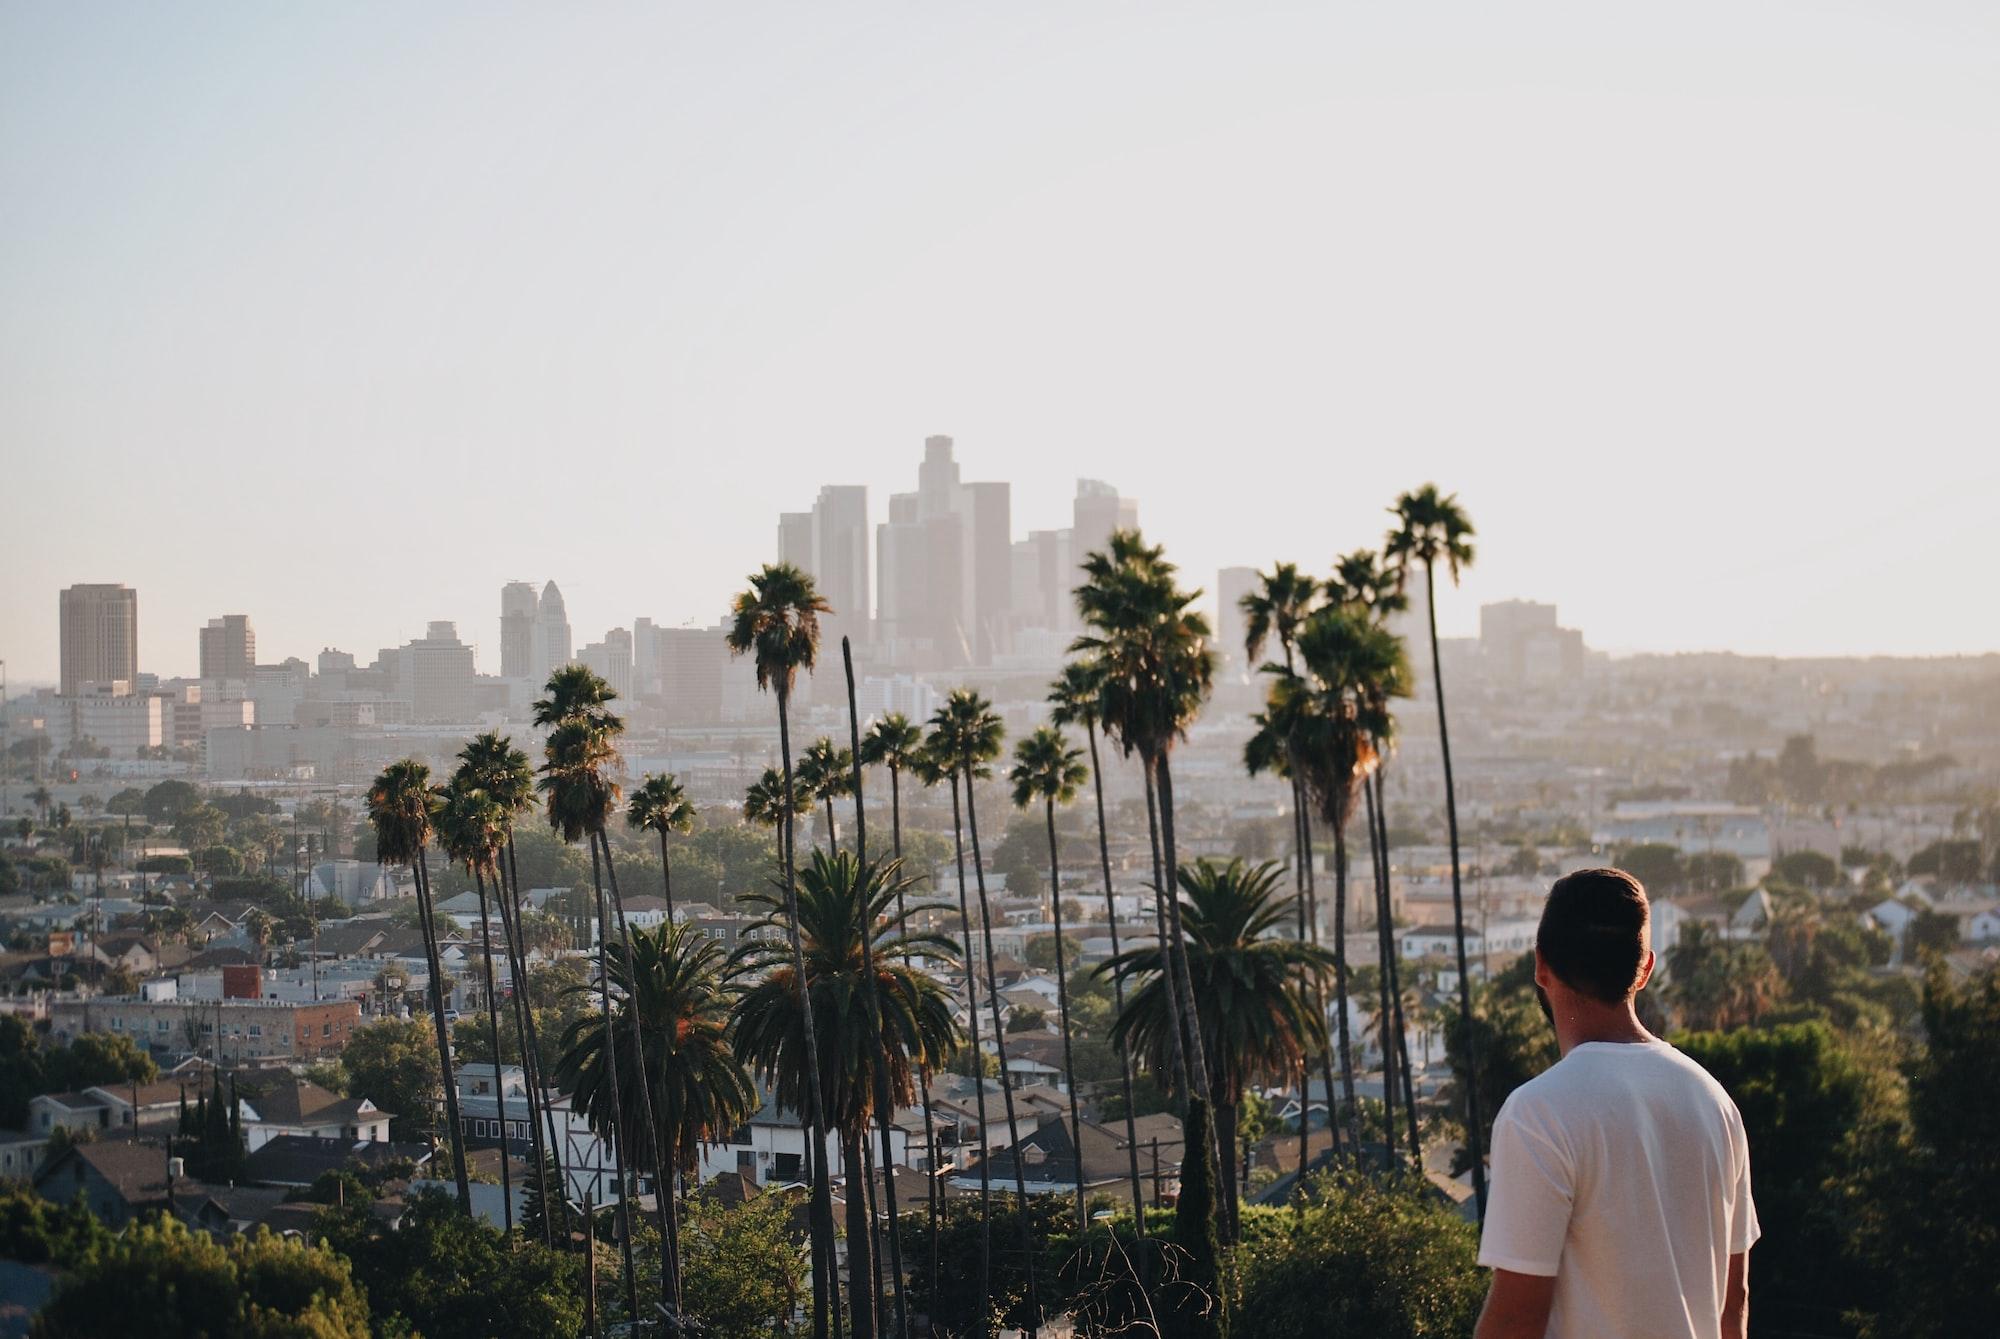 Why Everyone is Leaving Los Angeles